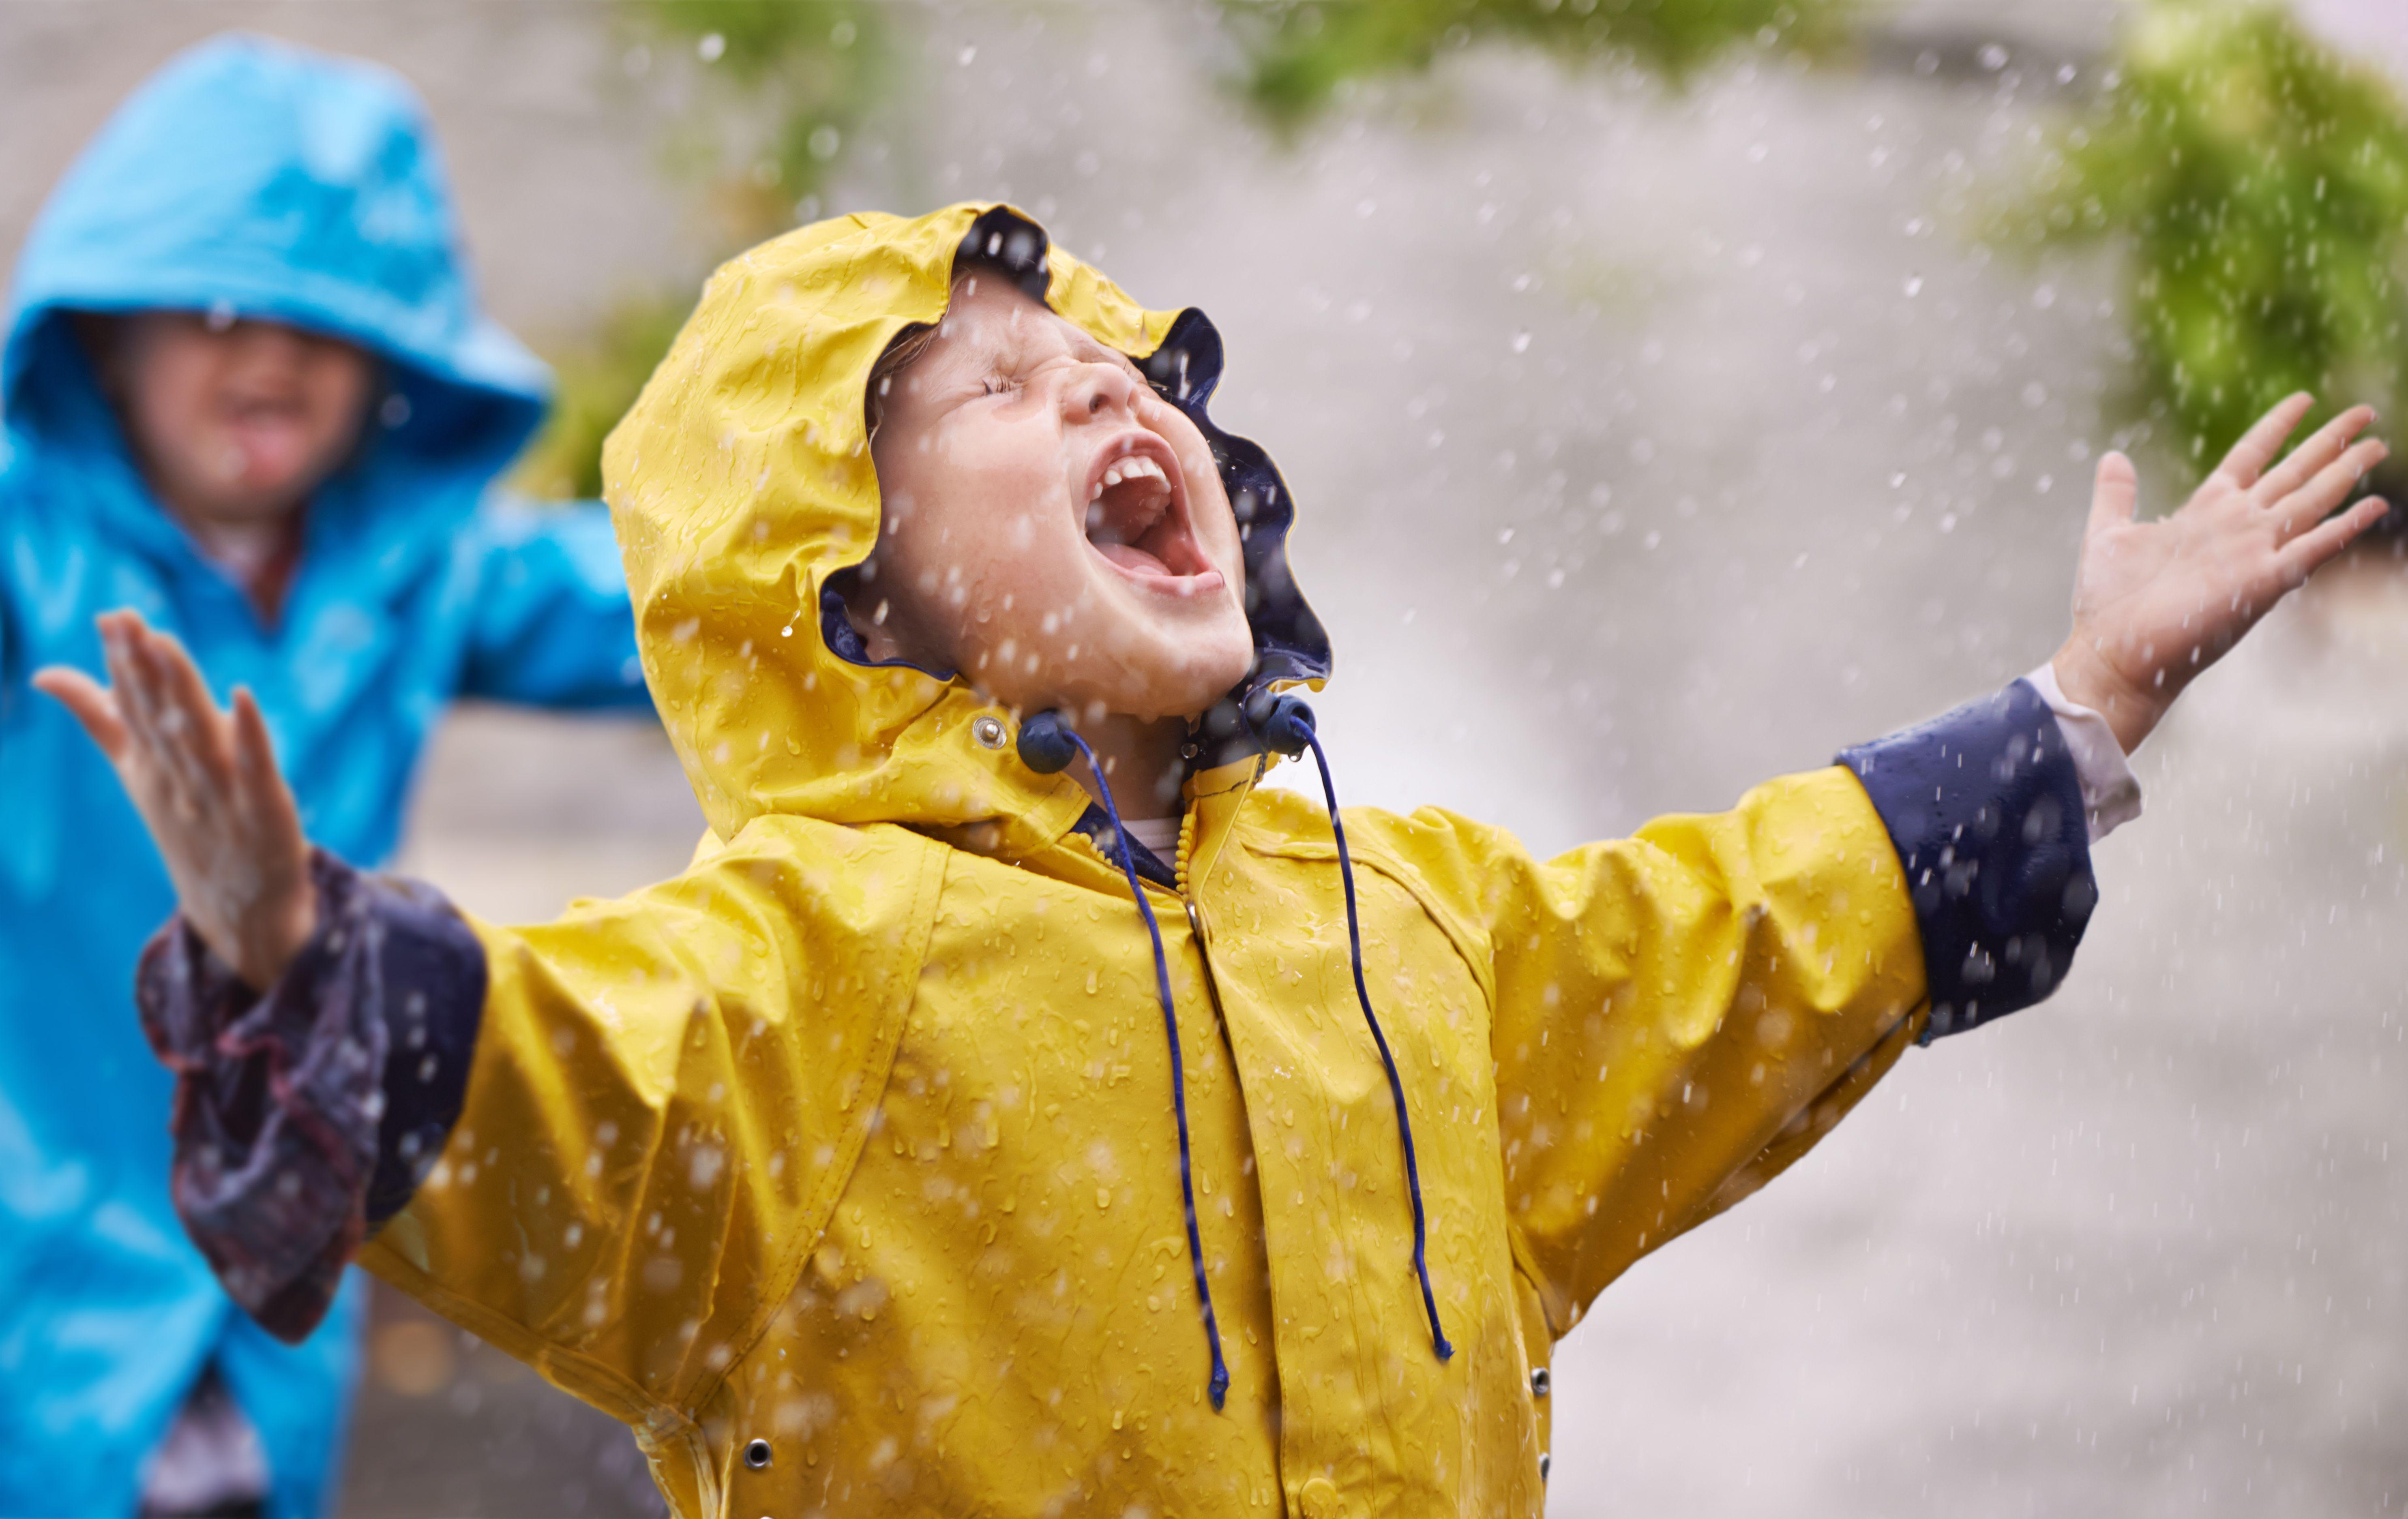 Rainy Day Outdoor Activities For Kids